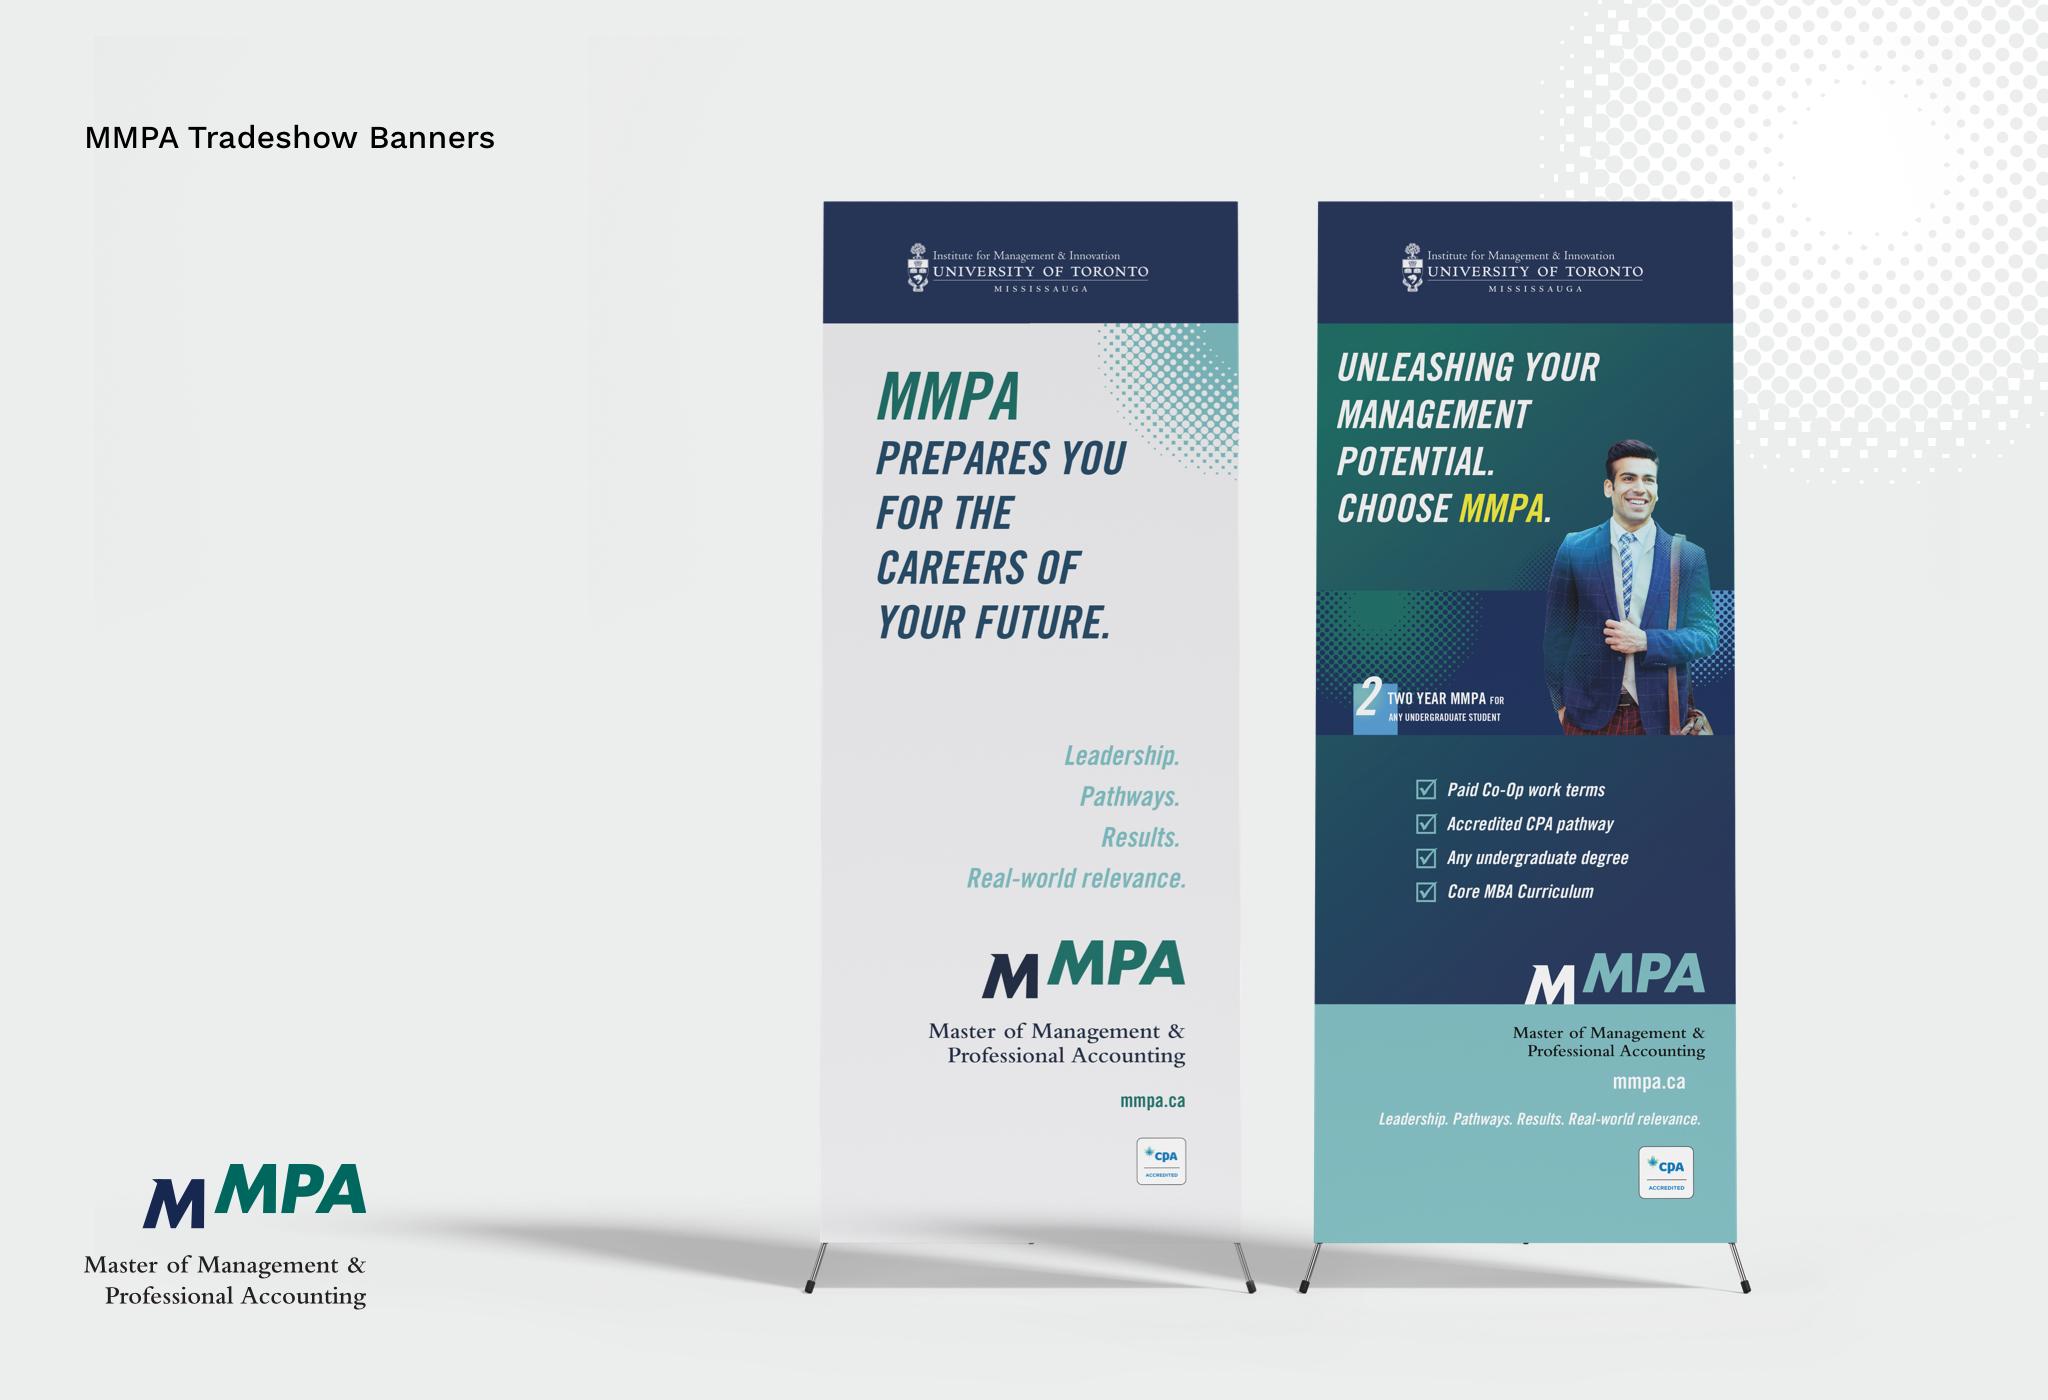 Photo of MMPA Tradeshow banners